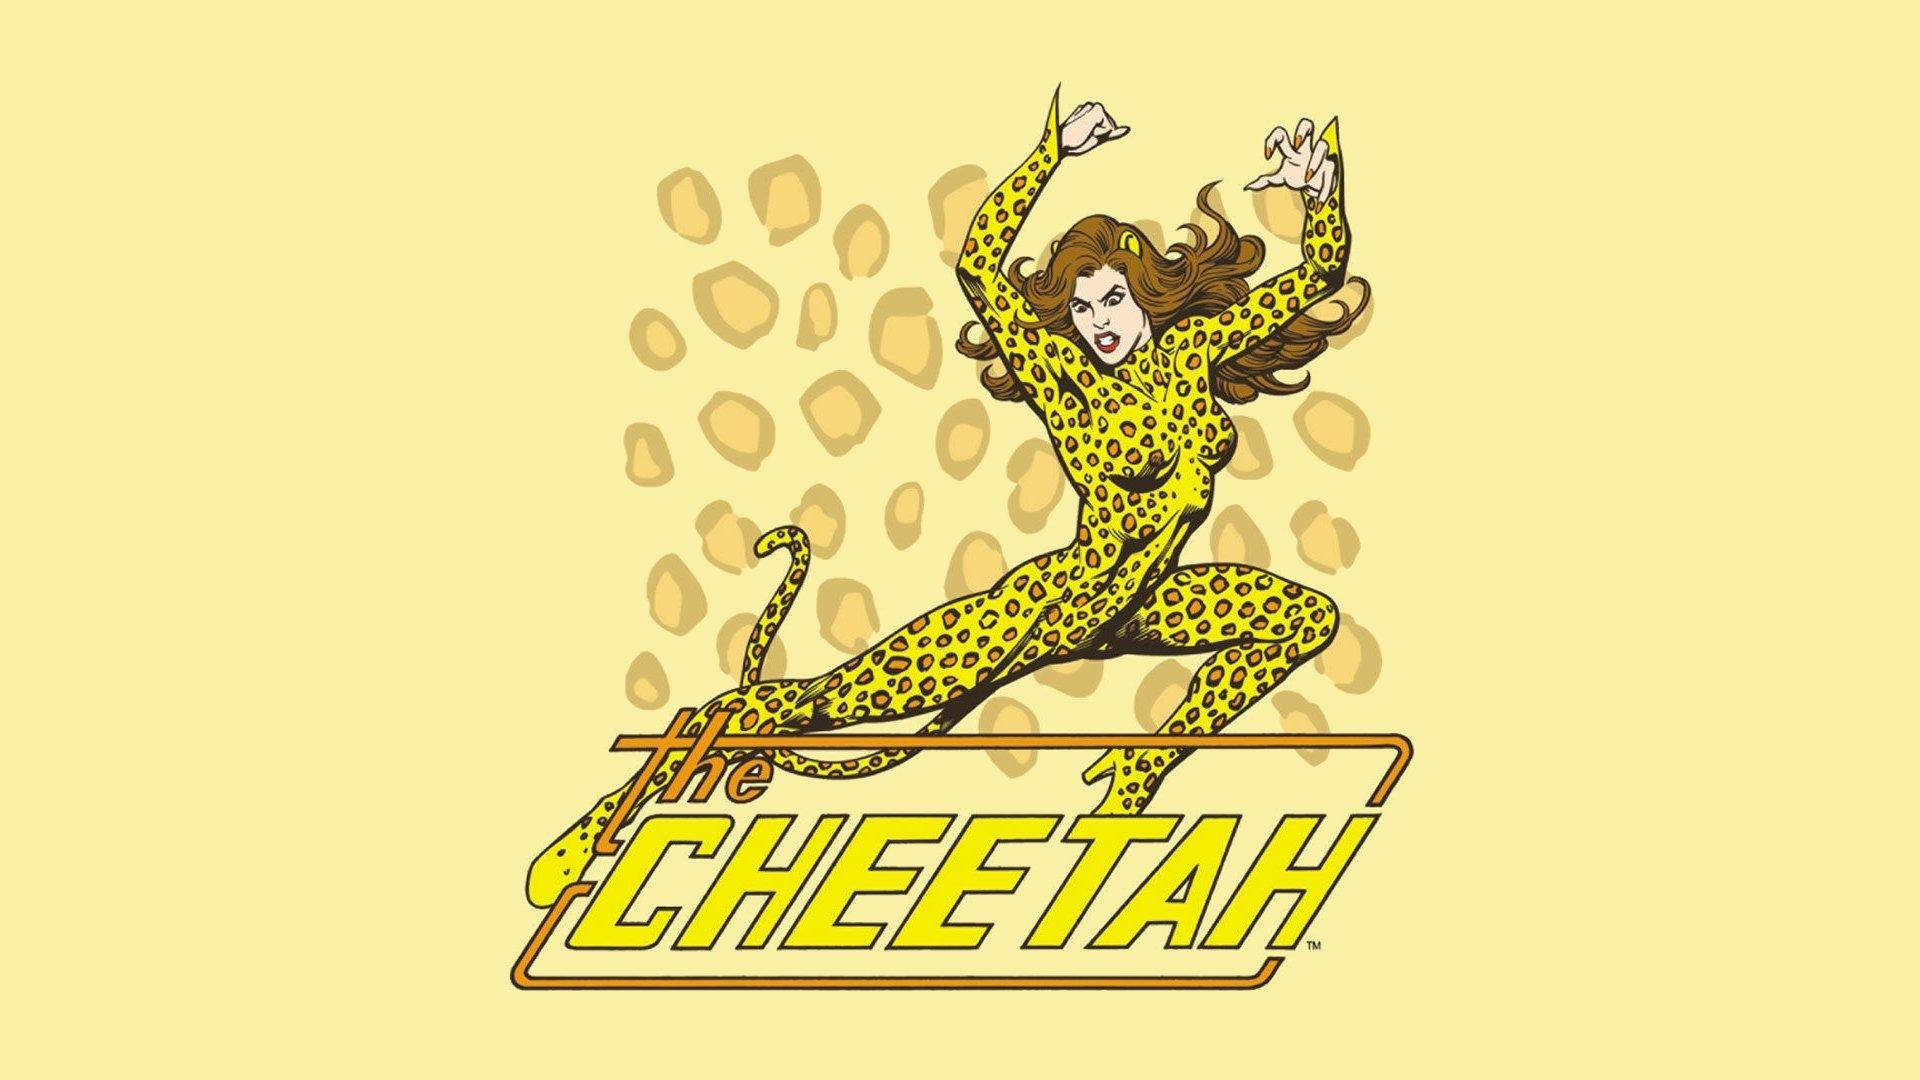 26 Cheetah DC ics HD Wallpapers